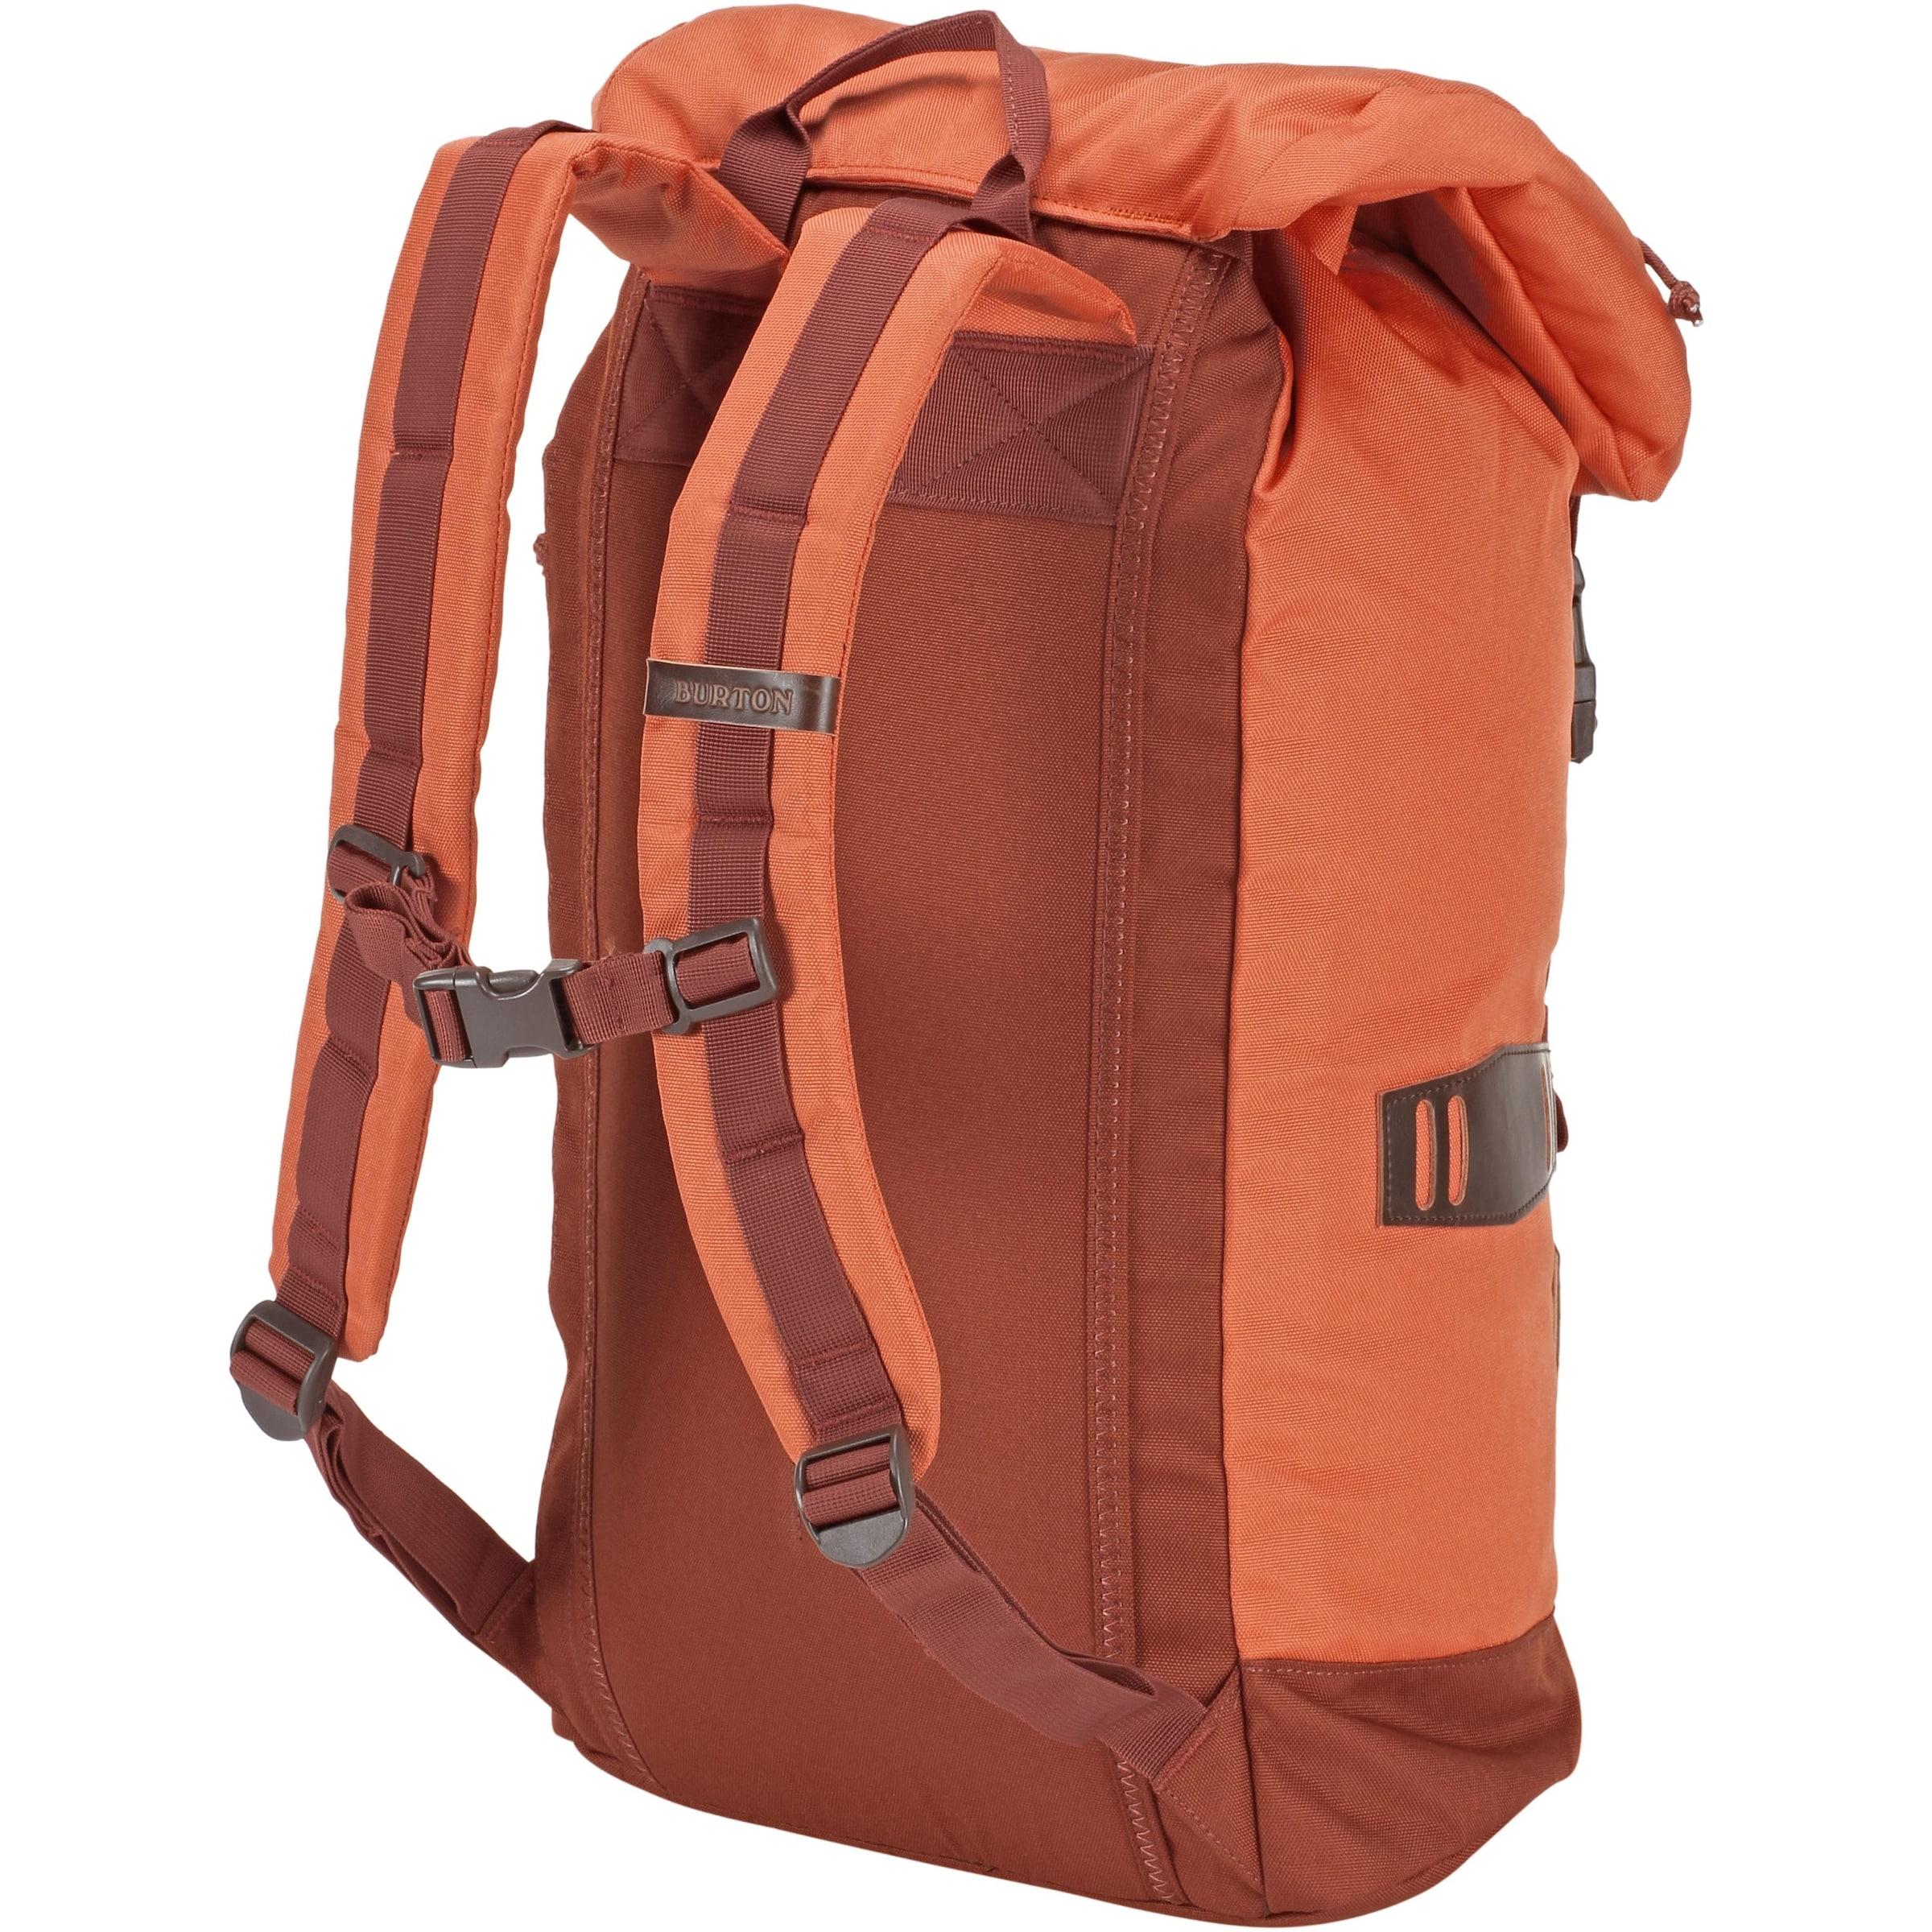 BURTON 'TINDER PACK' Daypack Rucksack Großhandelspreis Günstiger Preis li7NwvThb3